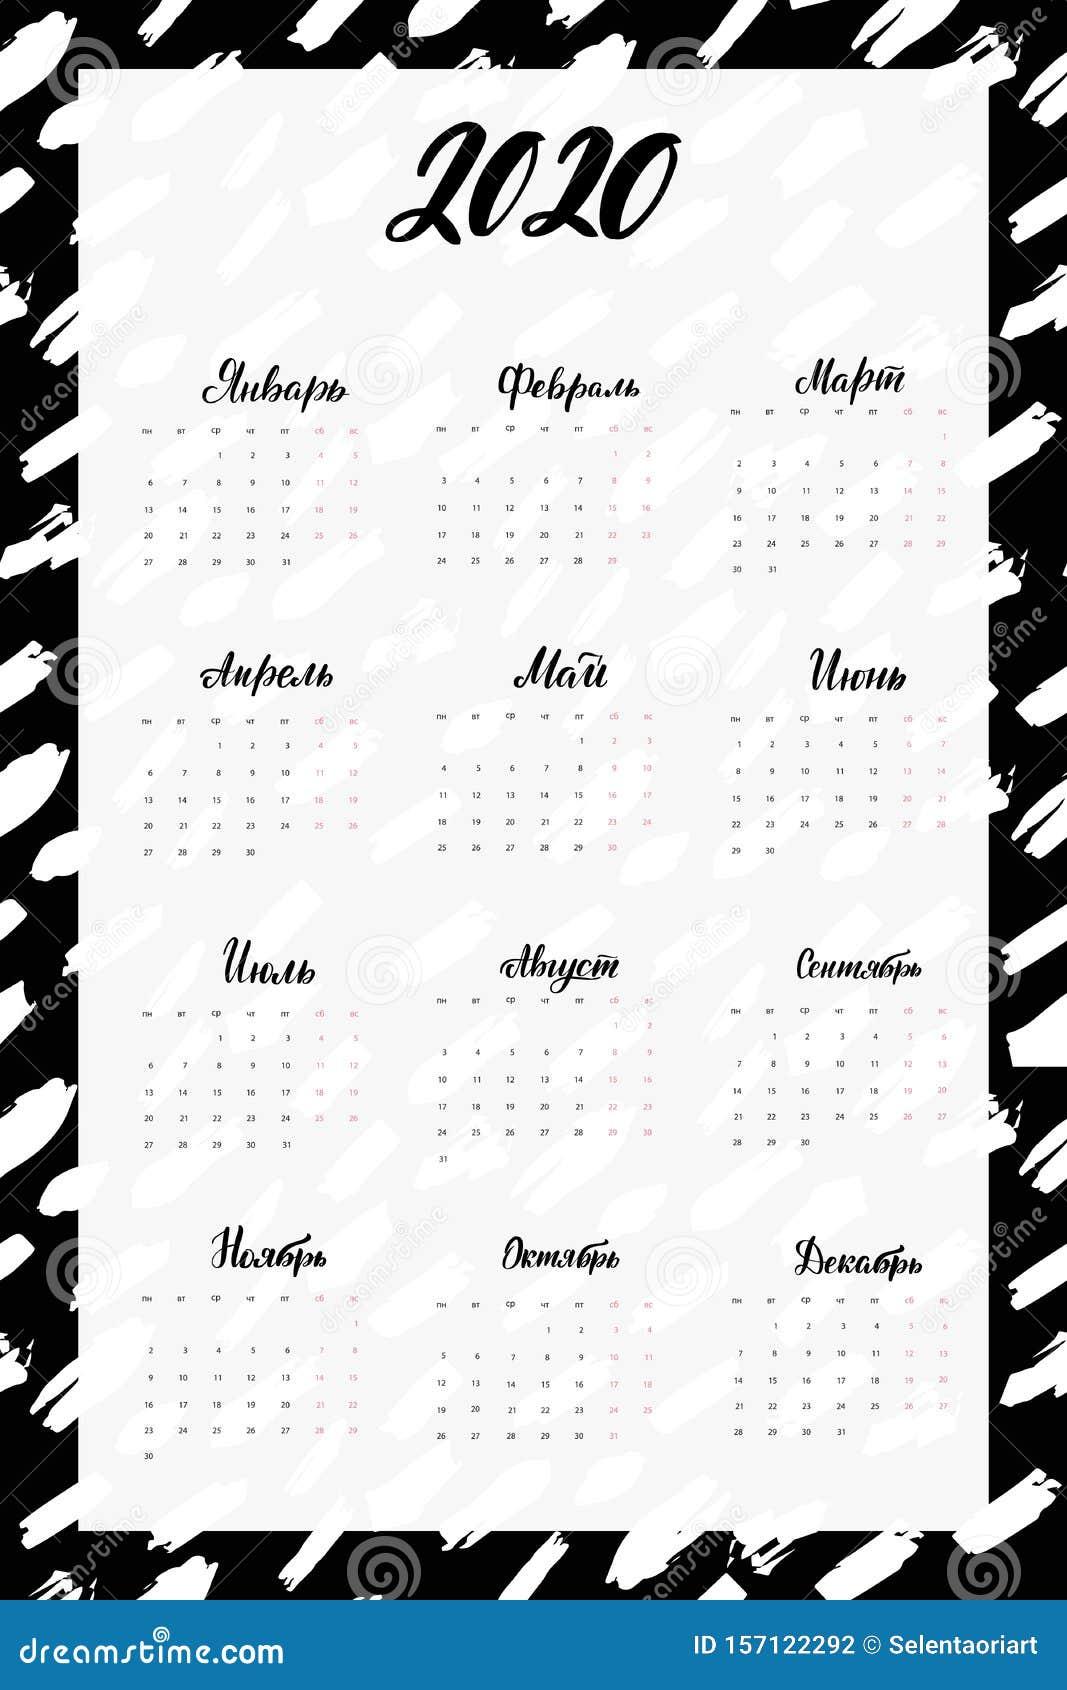 Russia 2020 Schedule.Russian Lettering Calendar 2020 Stock Illustration